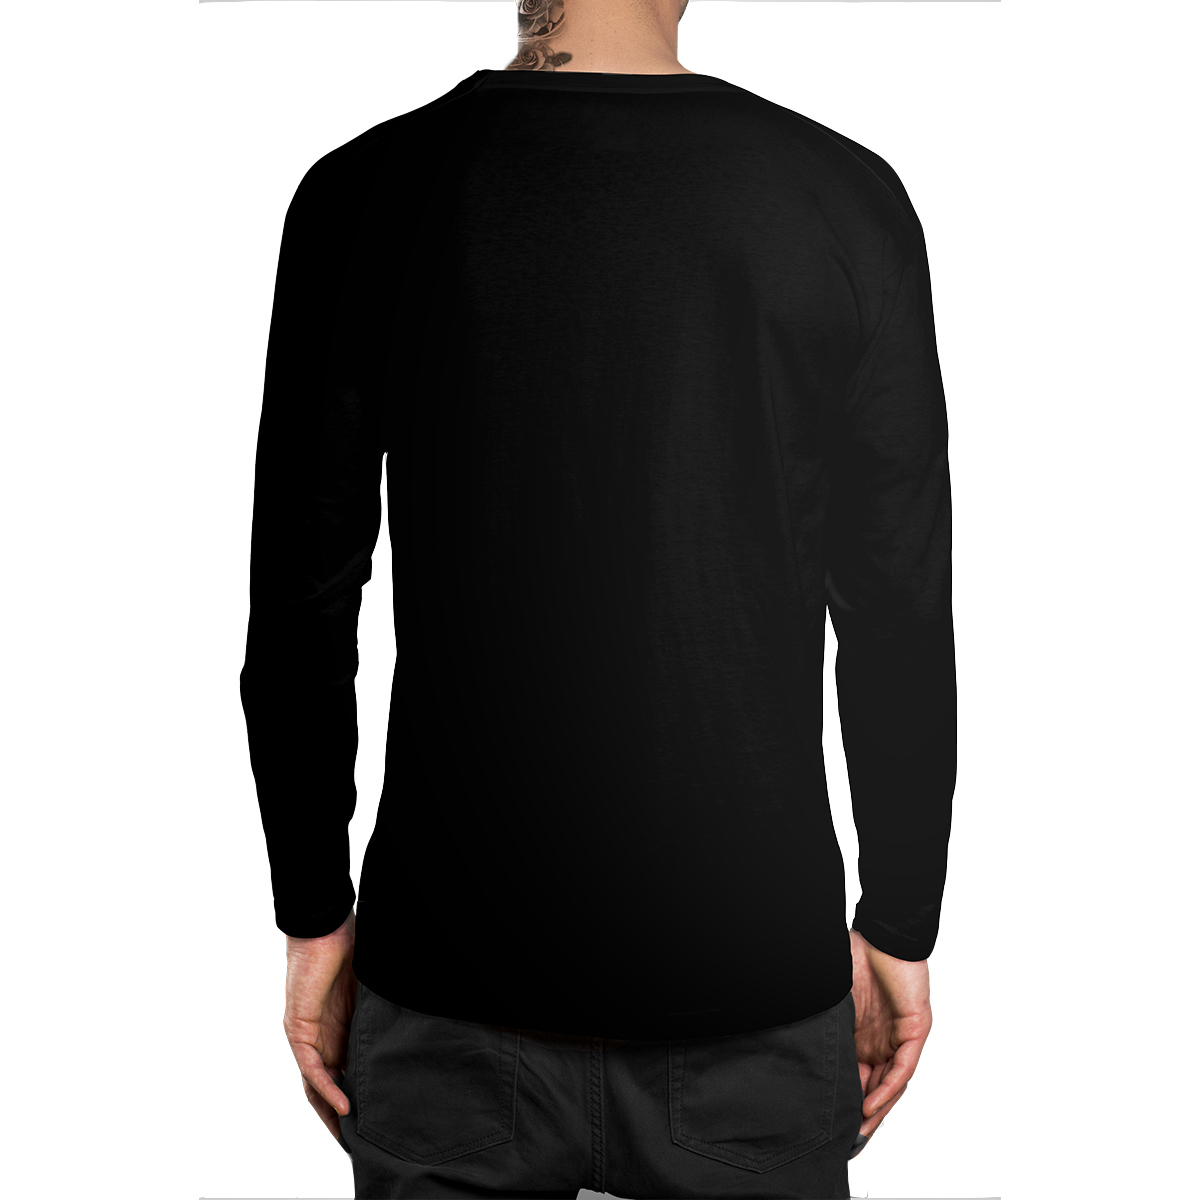 Stompy Camiseta Manga Longa Modelo 52